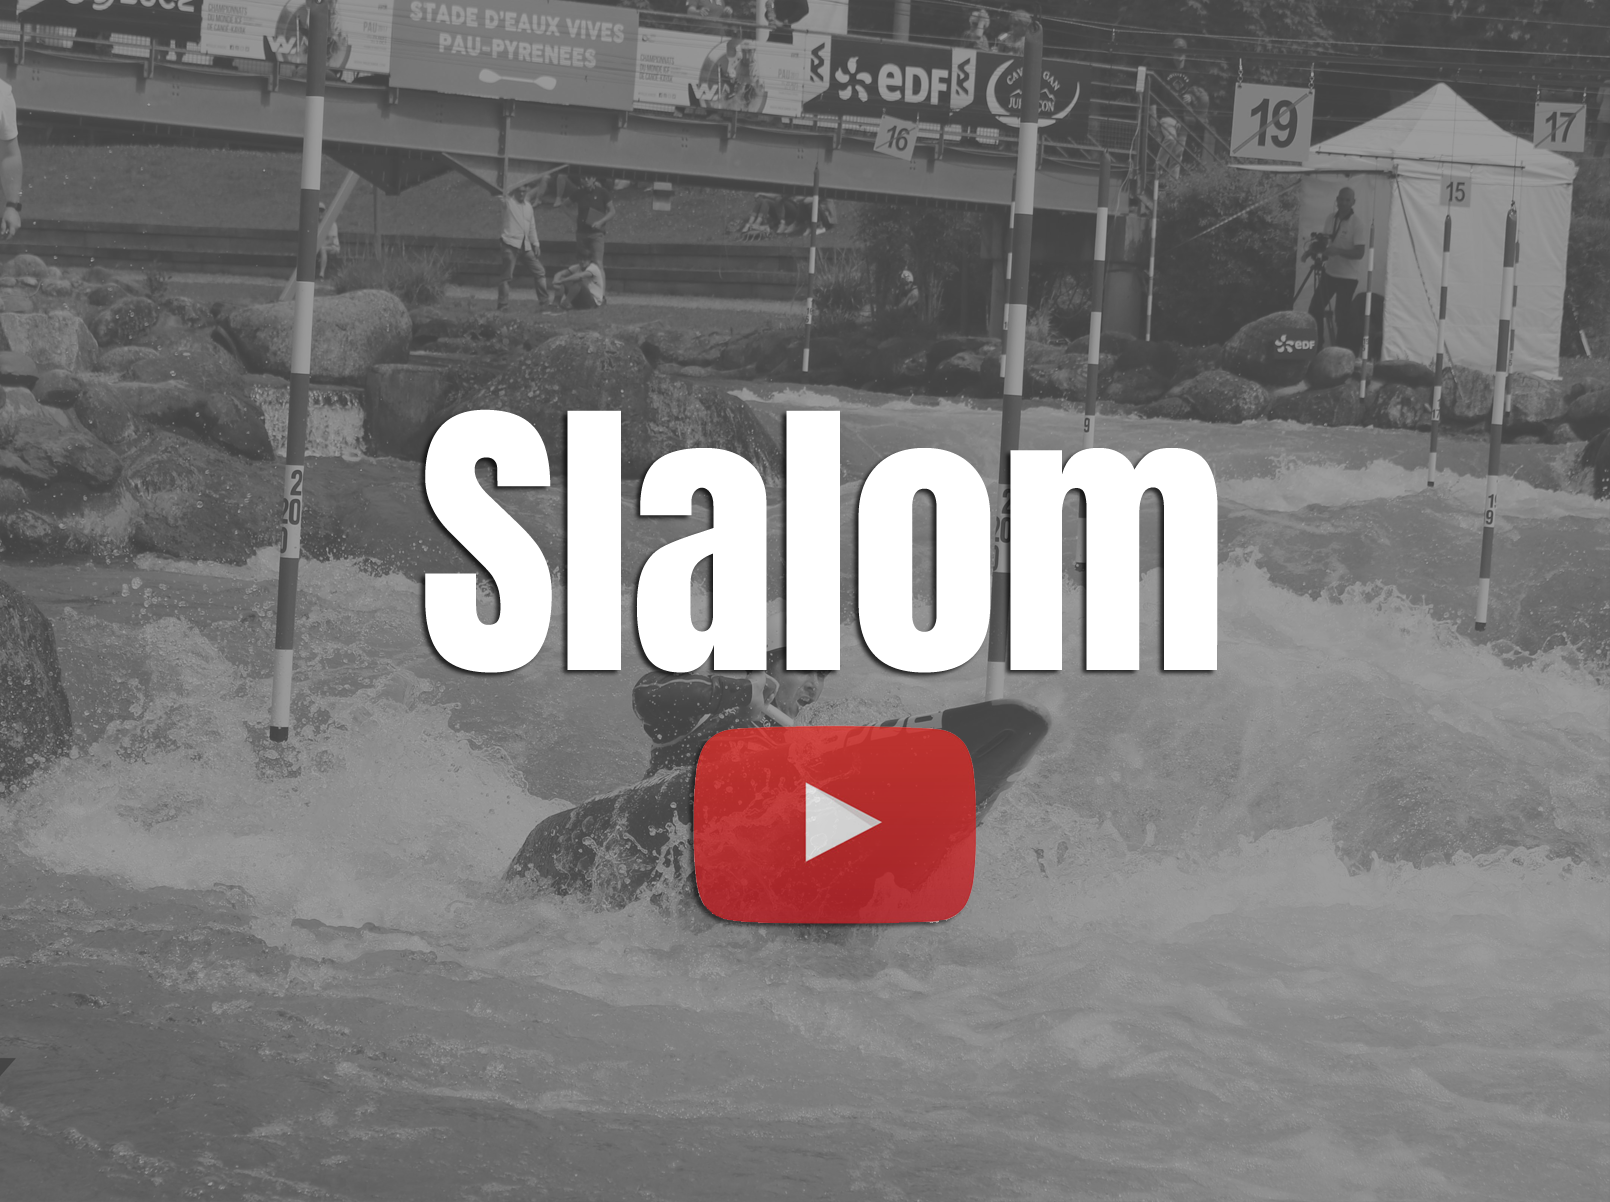 Vidéos slalom